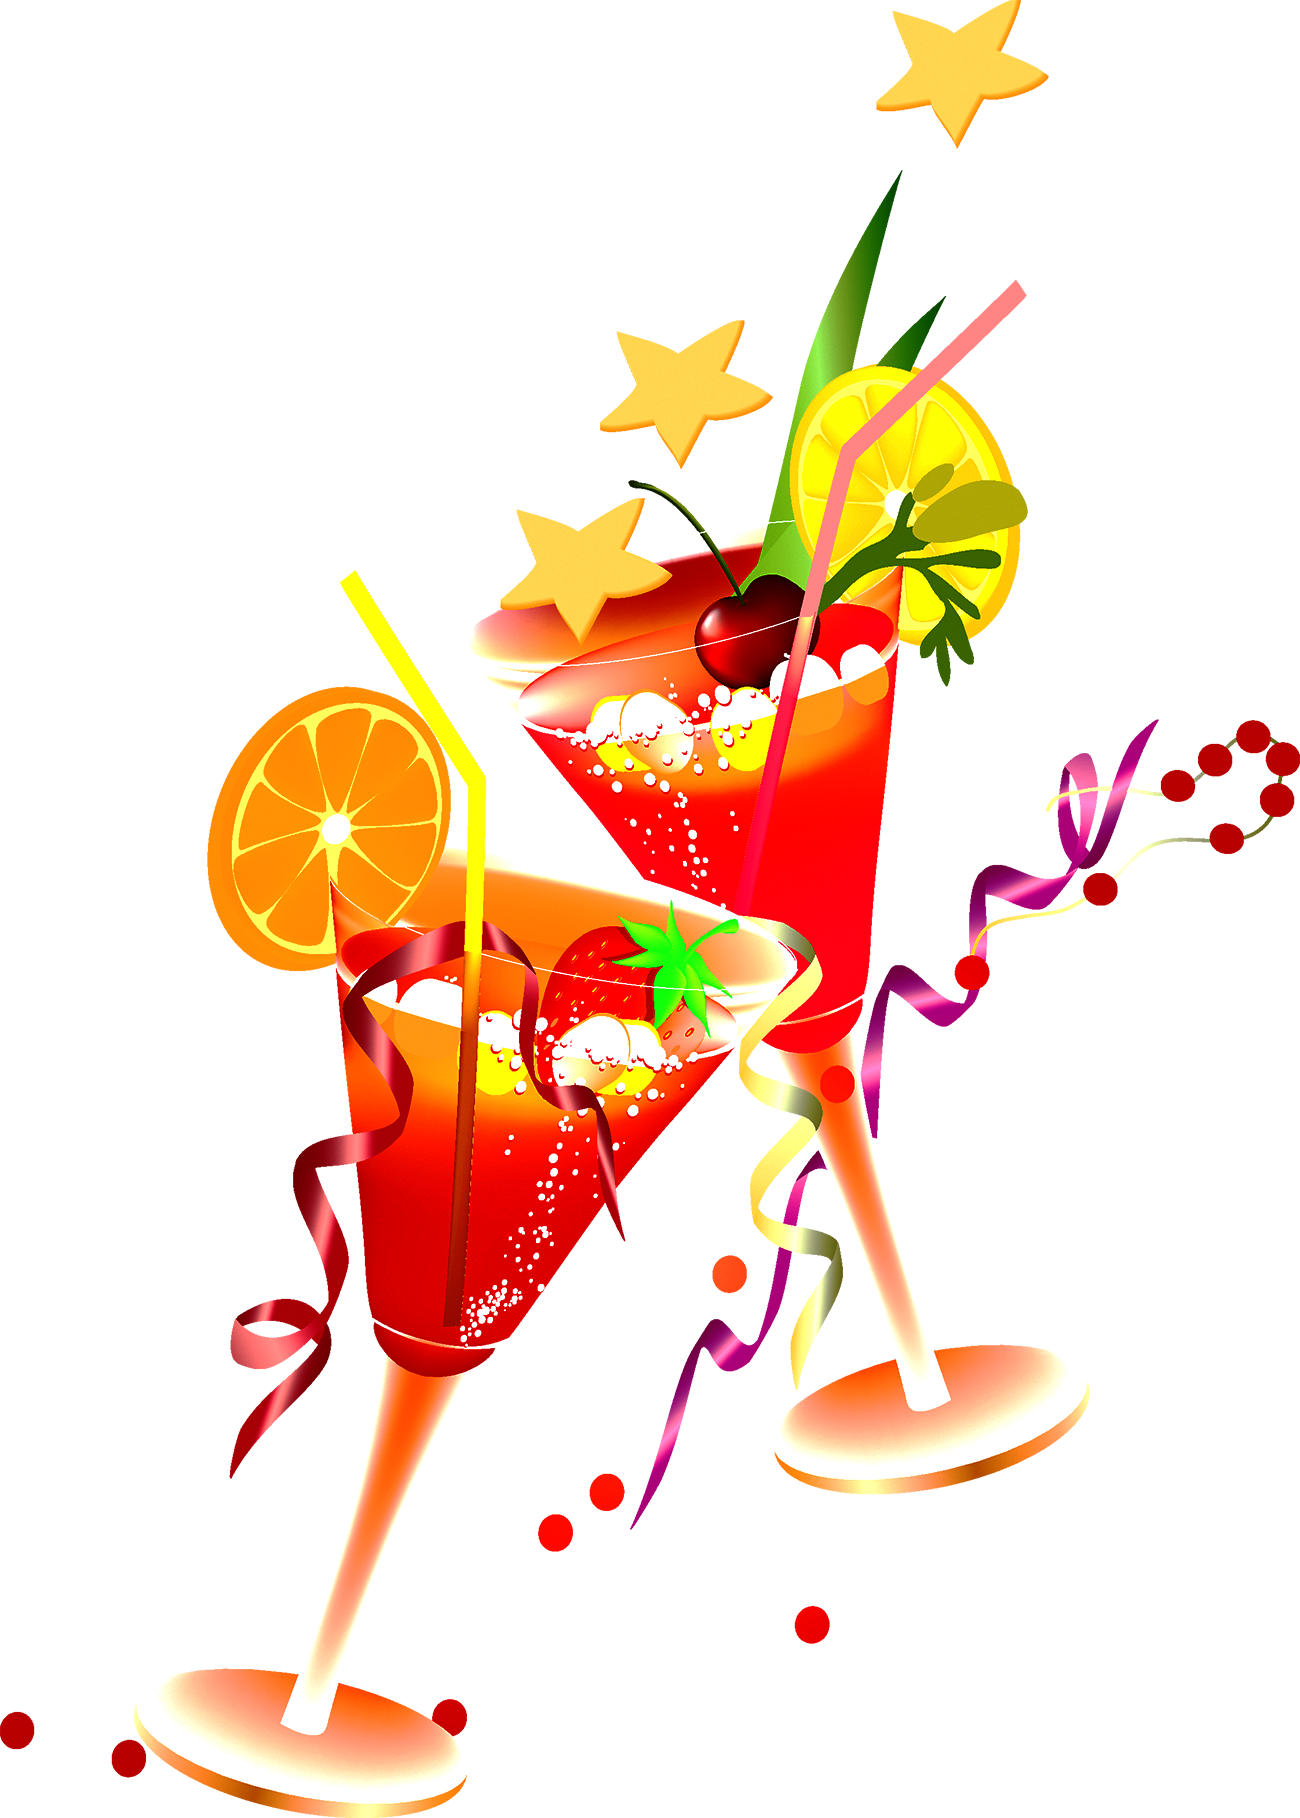 Cocktails clipart fruit cocktail. Salad alcoholic drink transprent